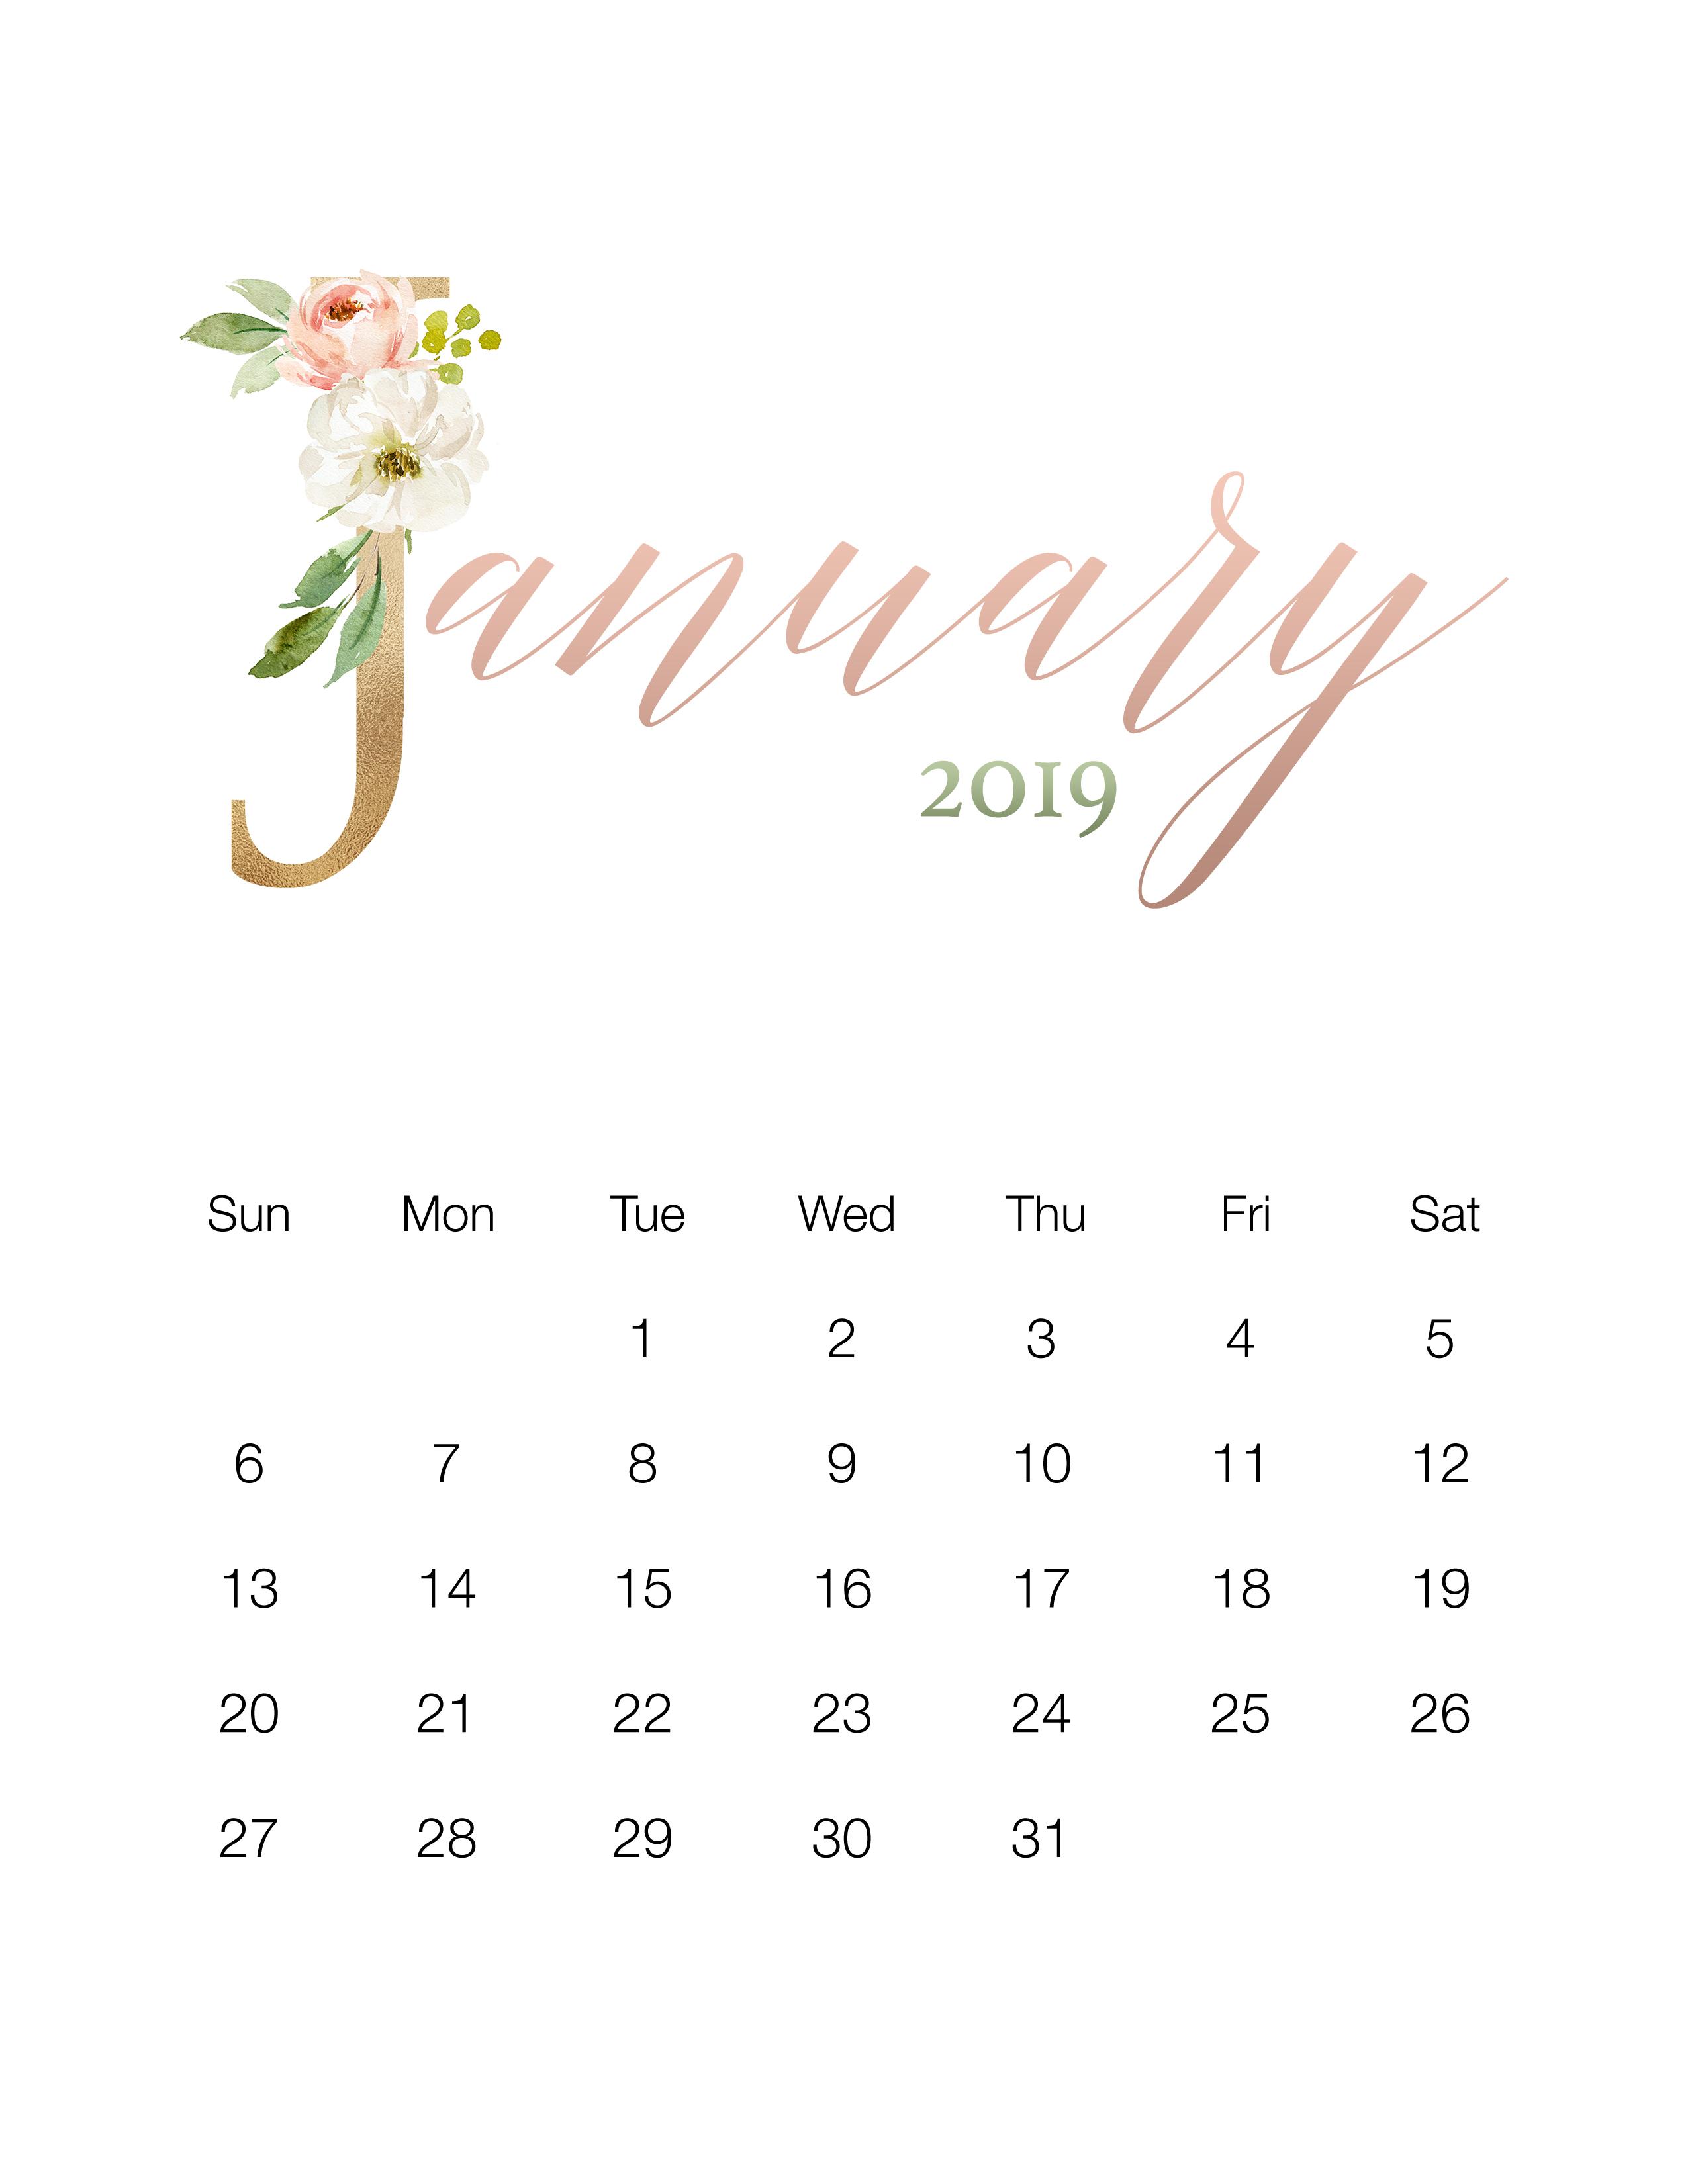 Pretty Floral Free Printable 2019 Calendar The Cottage Market